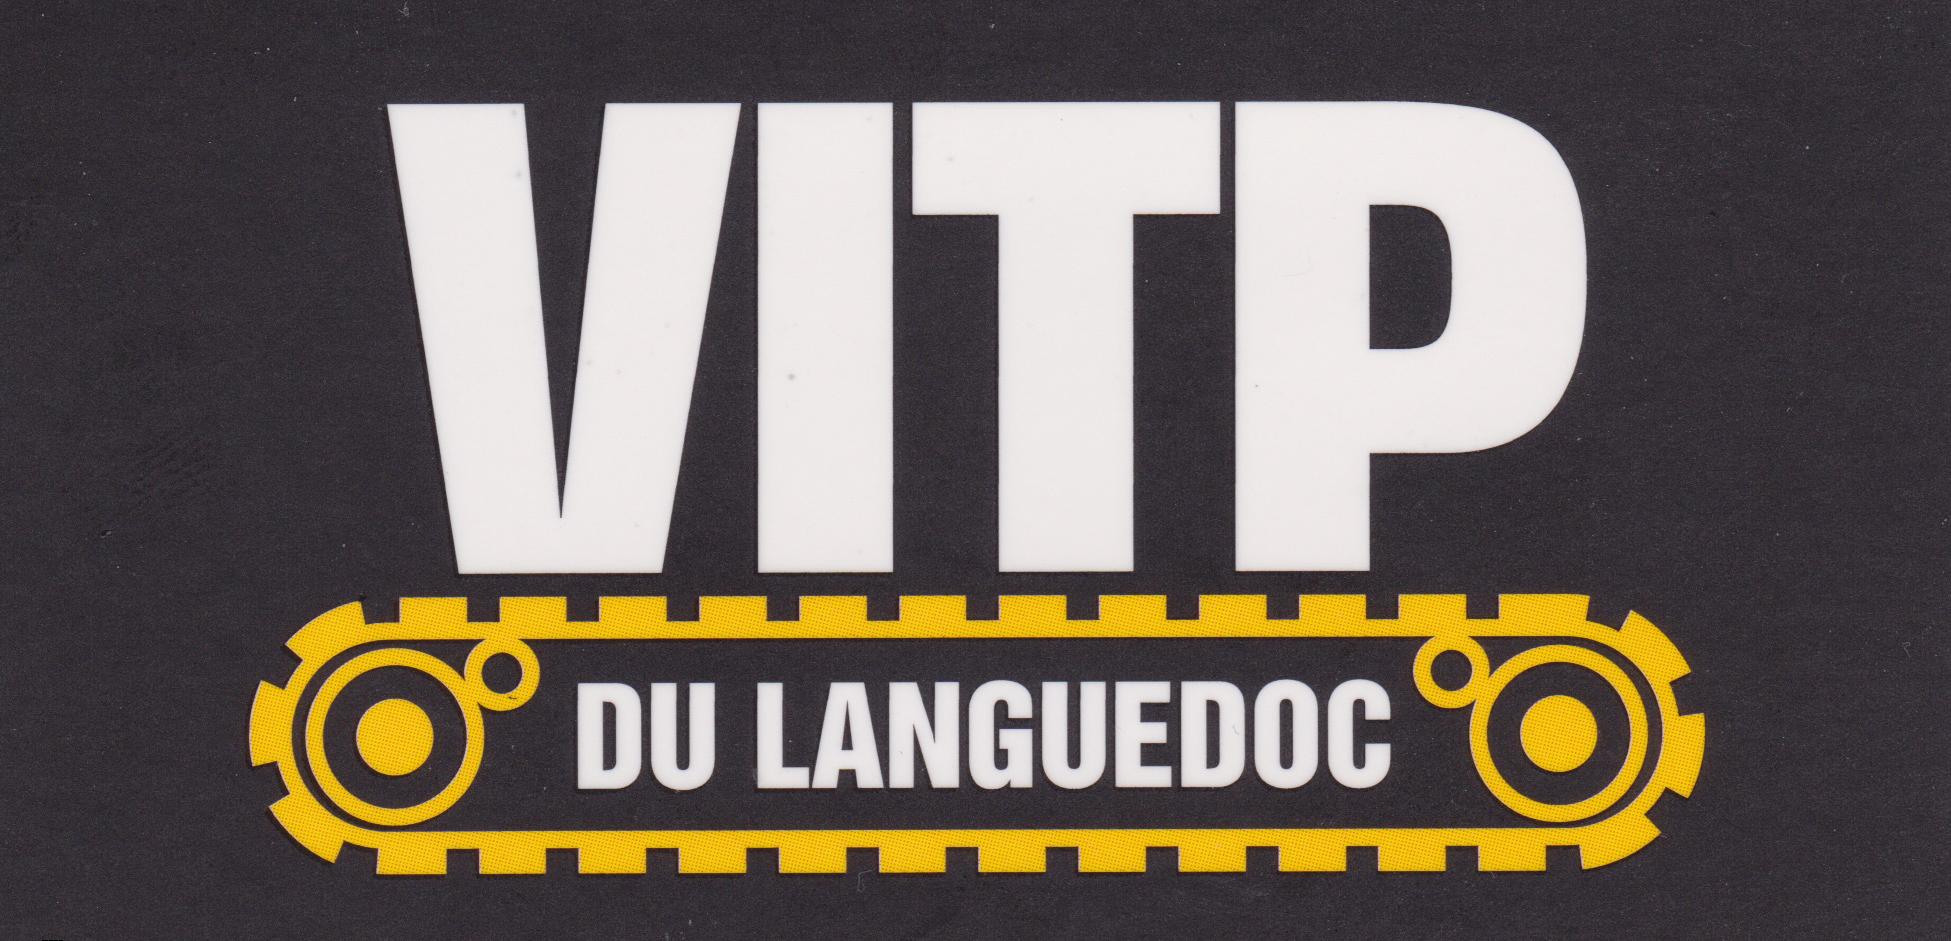 Logo VITP fond noir